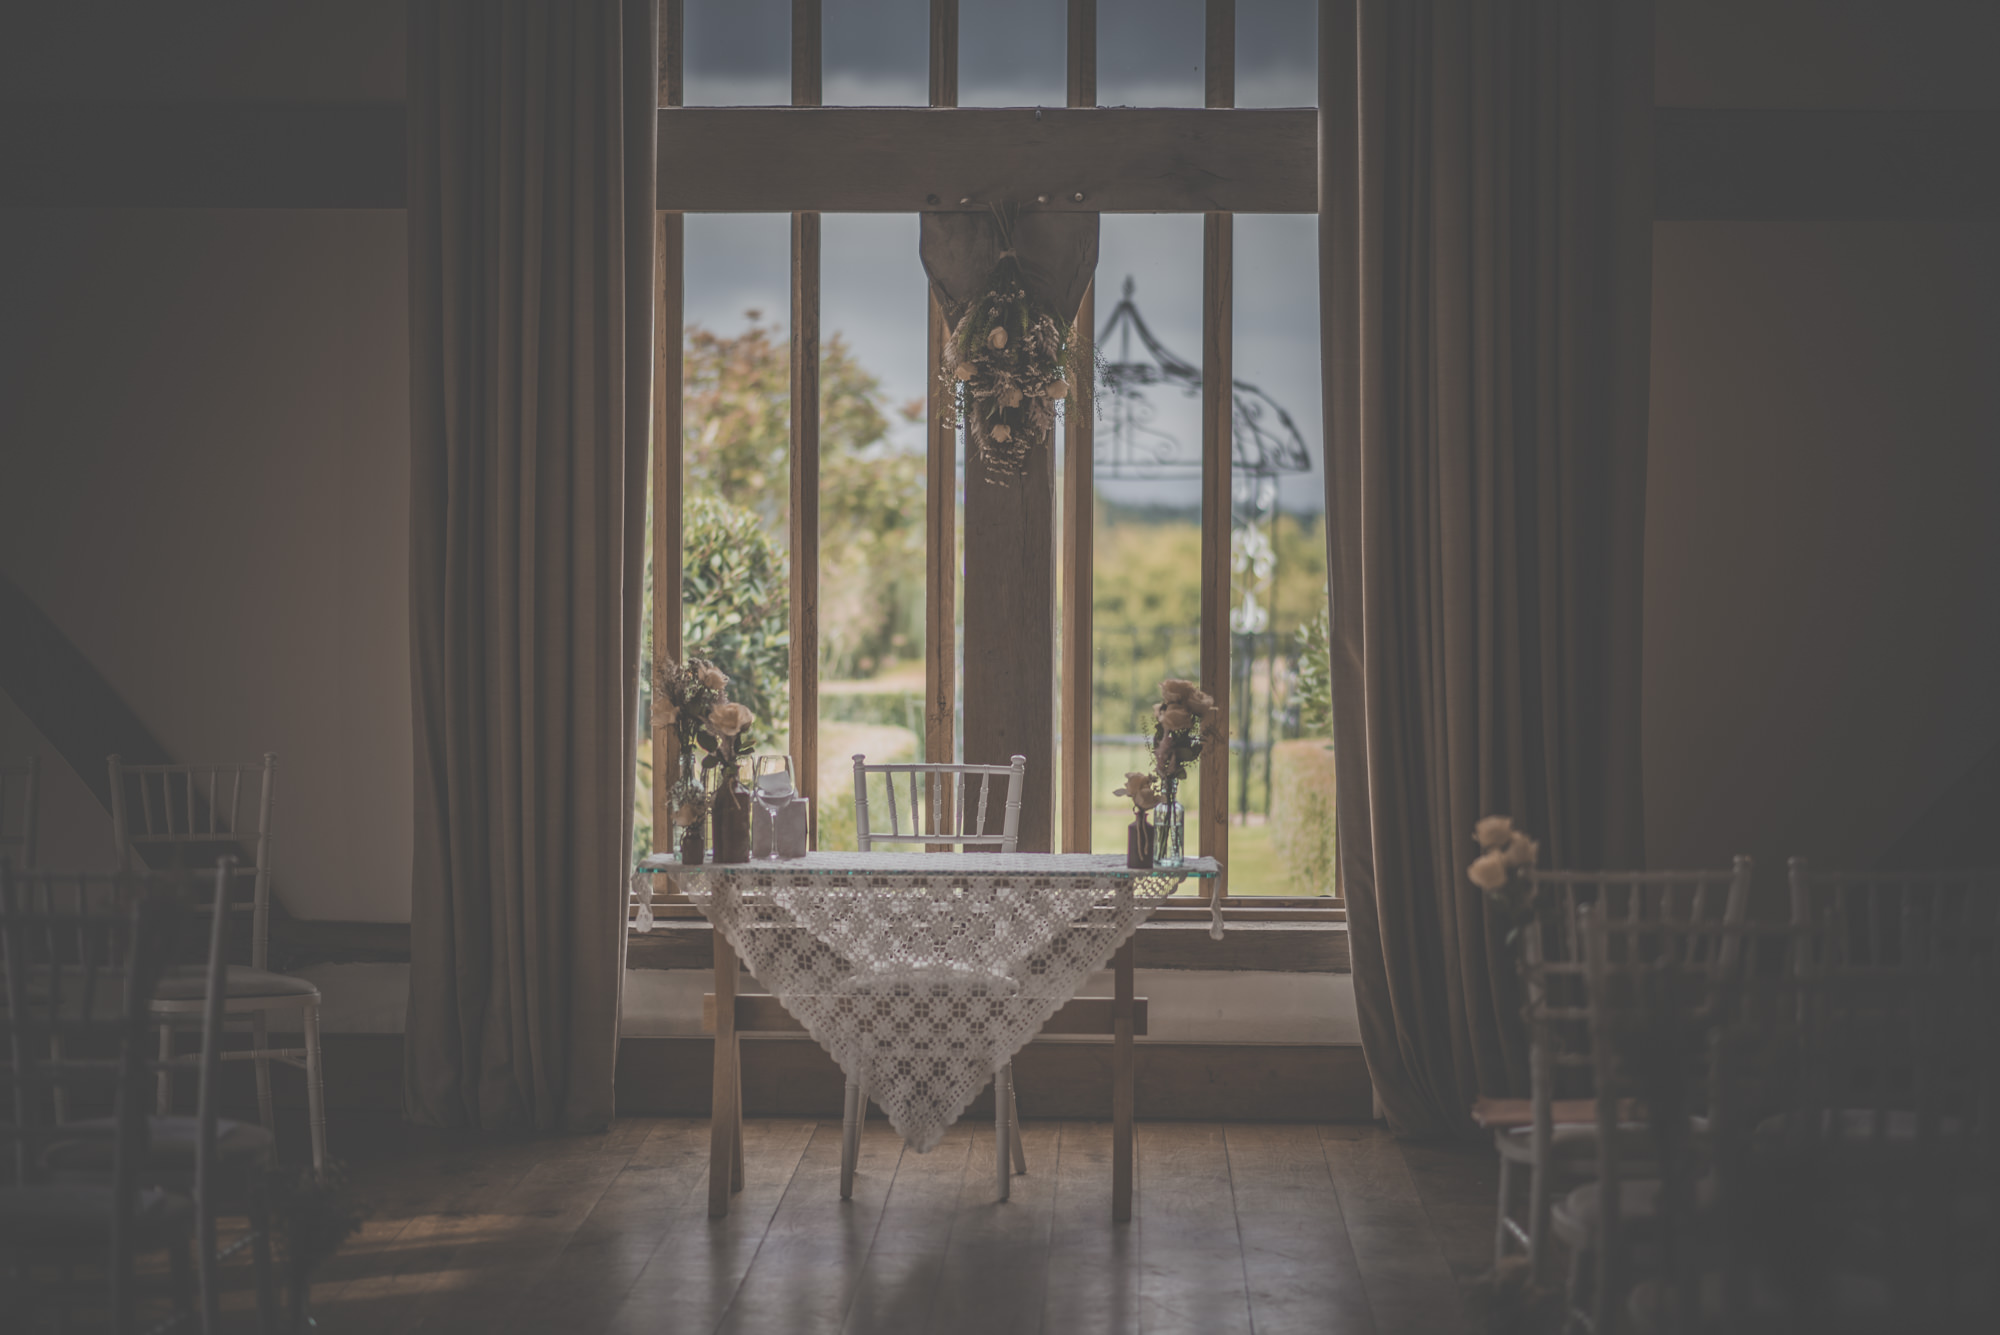 Wedding Ceremony in Cain Manor Hampshire